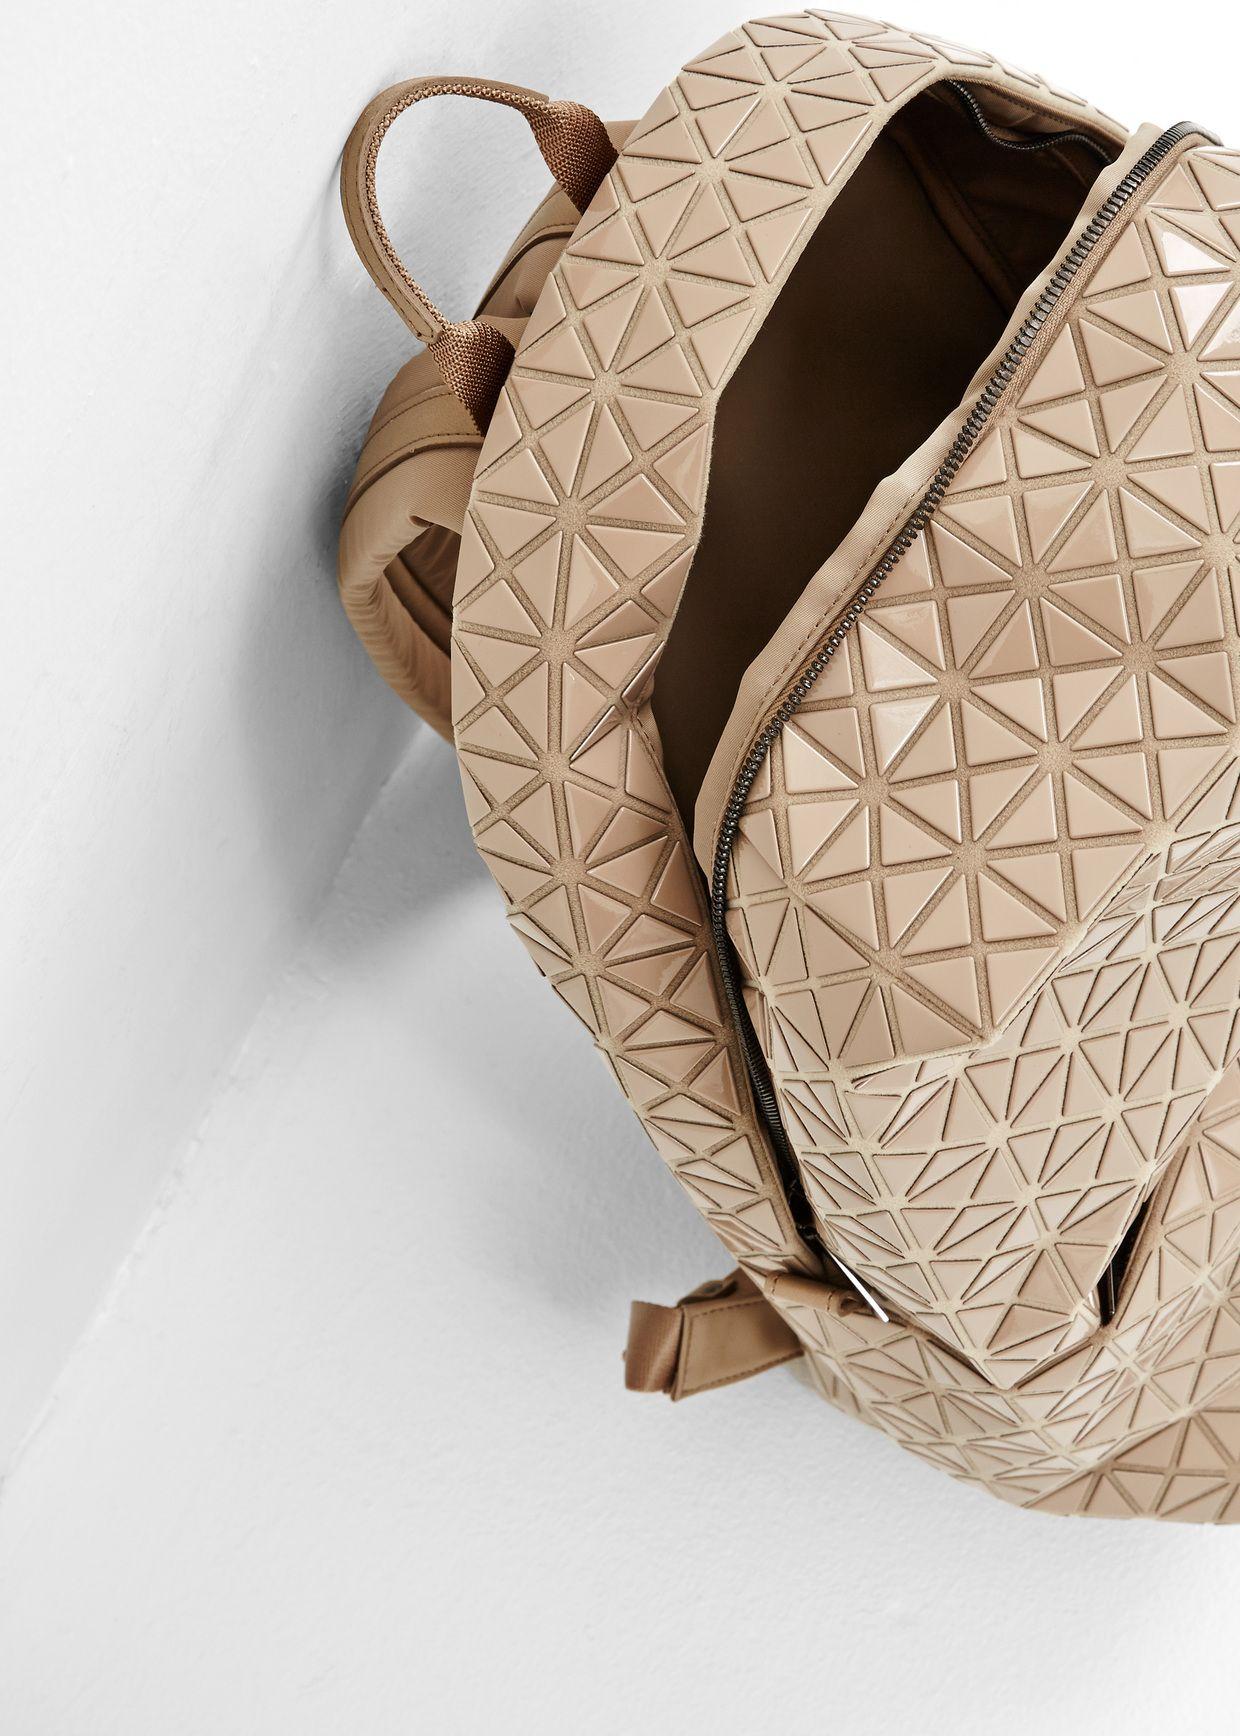 Totokaelo Issey Miyake Bao Bao Beige Backpack 1 196 00 Bags Beige Backpacks Bag Accessories